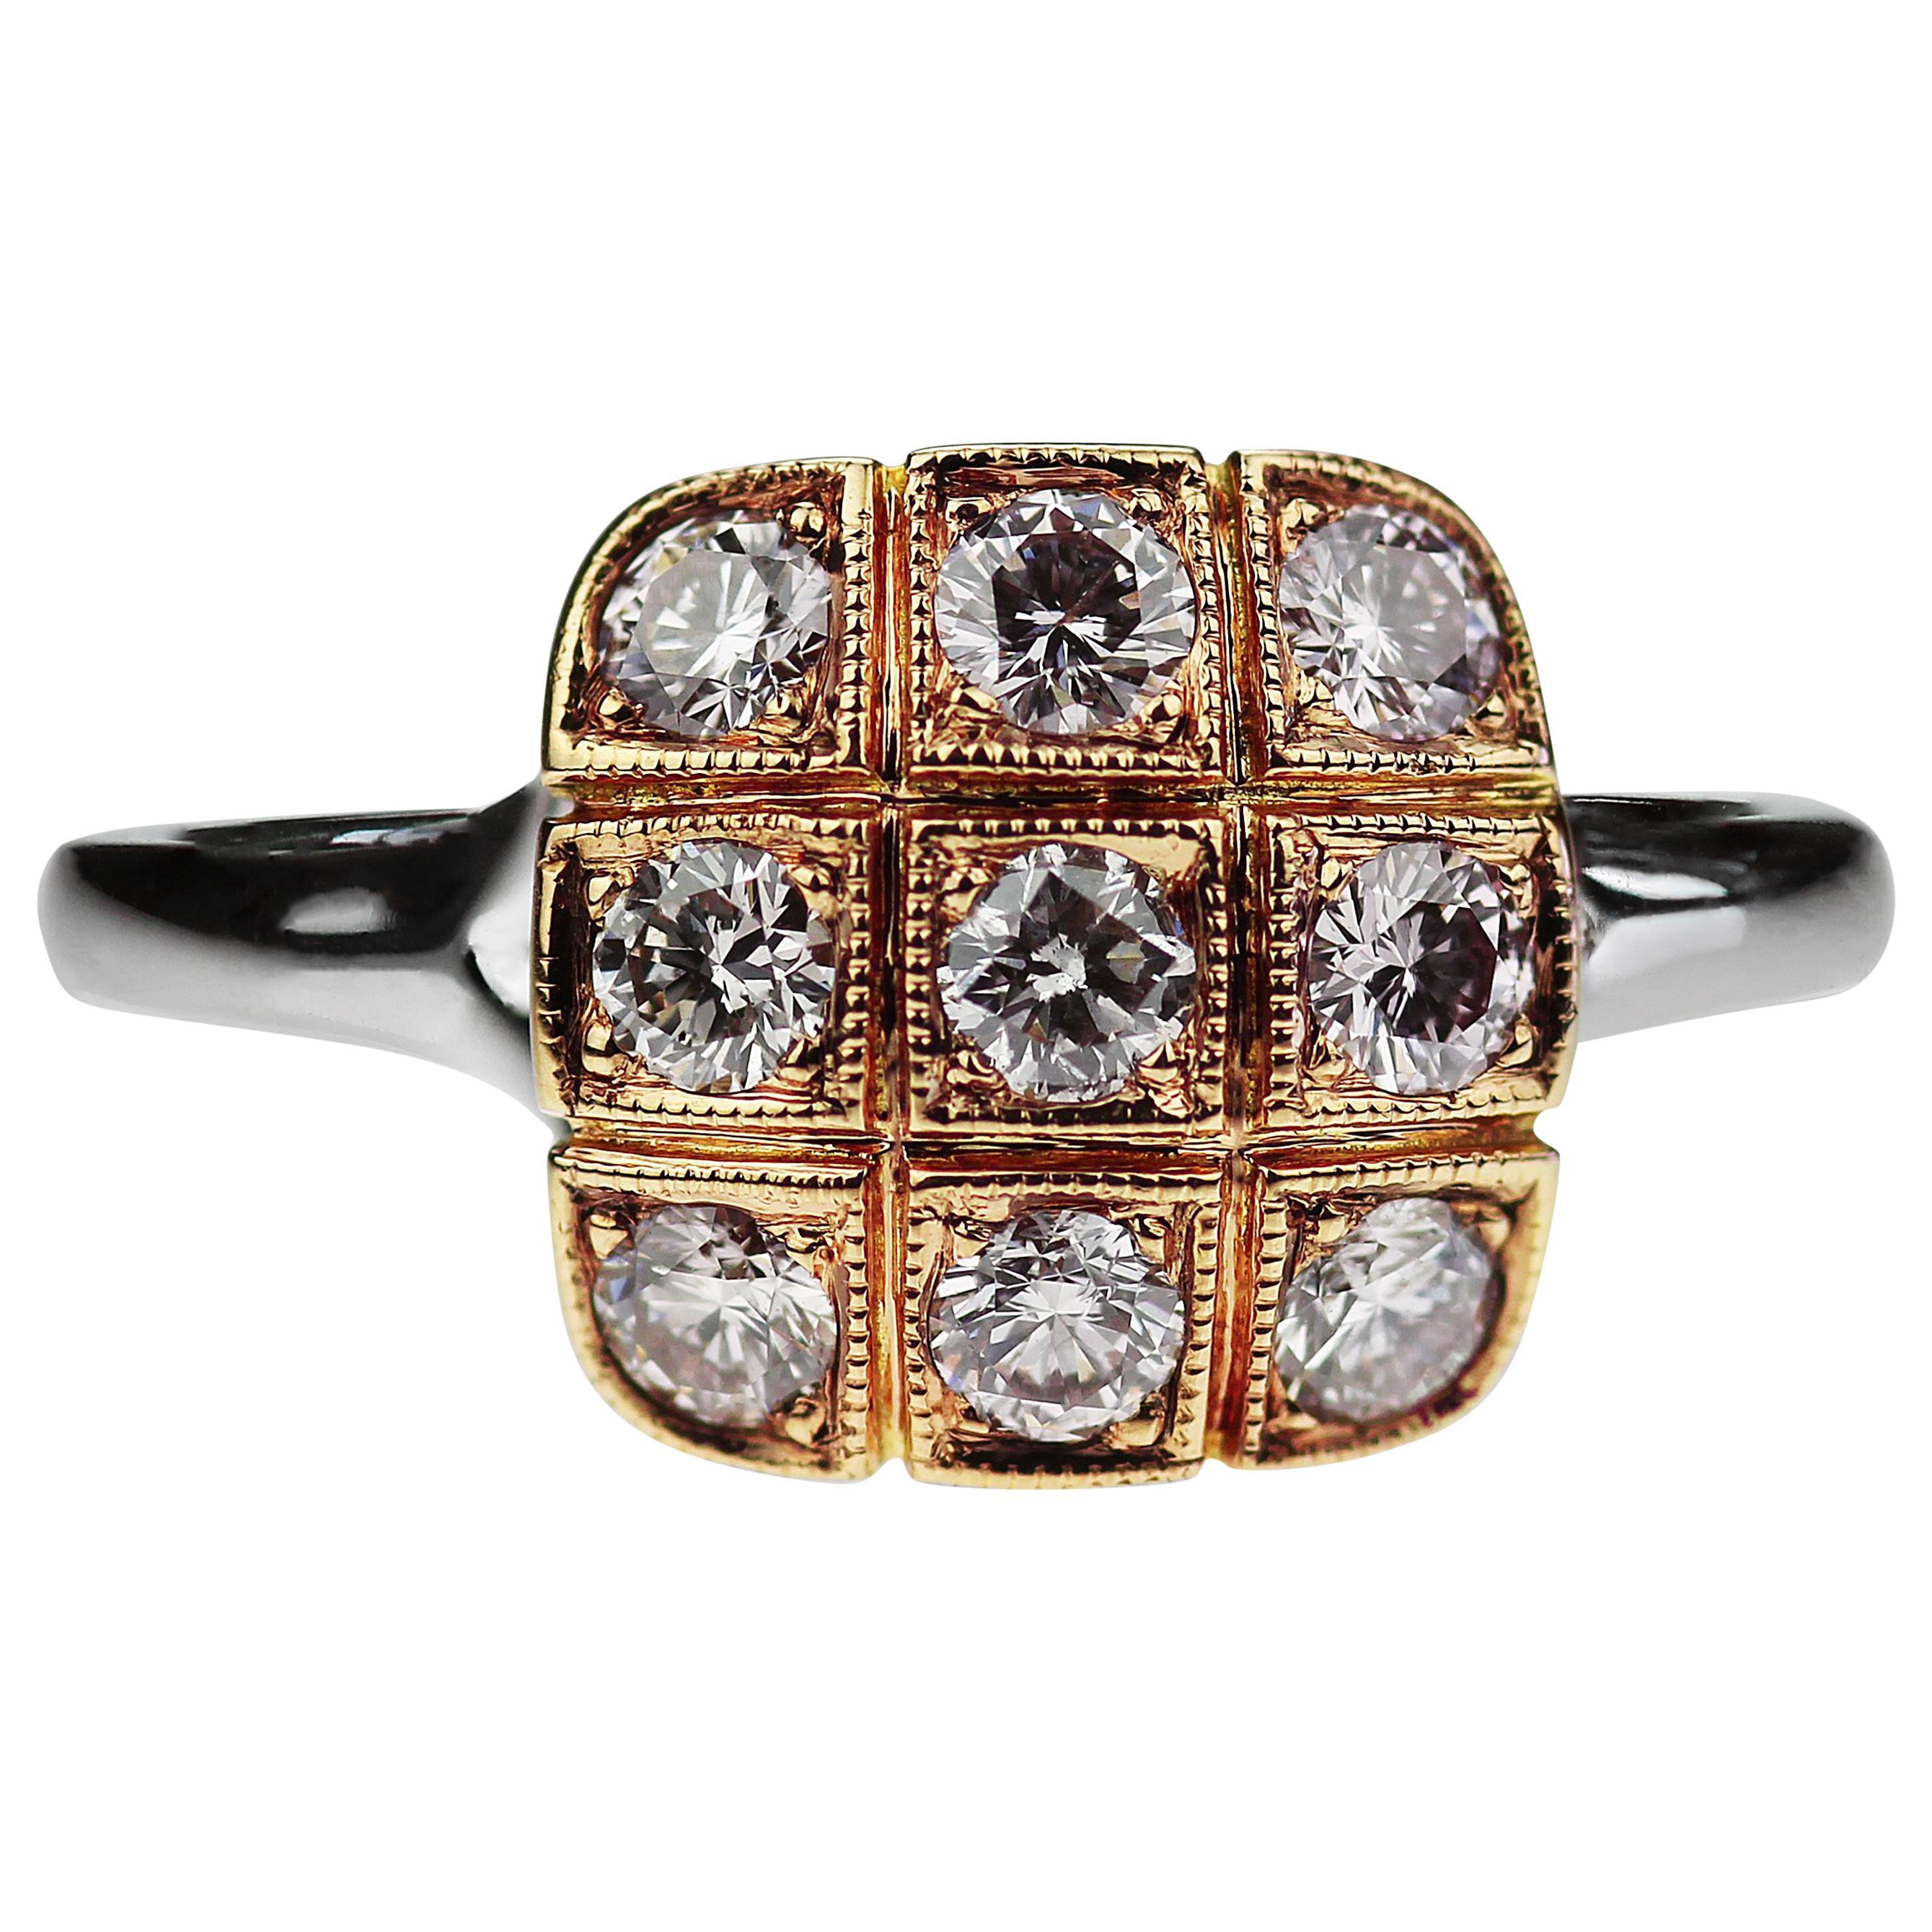 Natural Pink Diamond Square Cluster Ring in Bimetal 18K White & Rose Gold